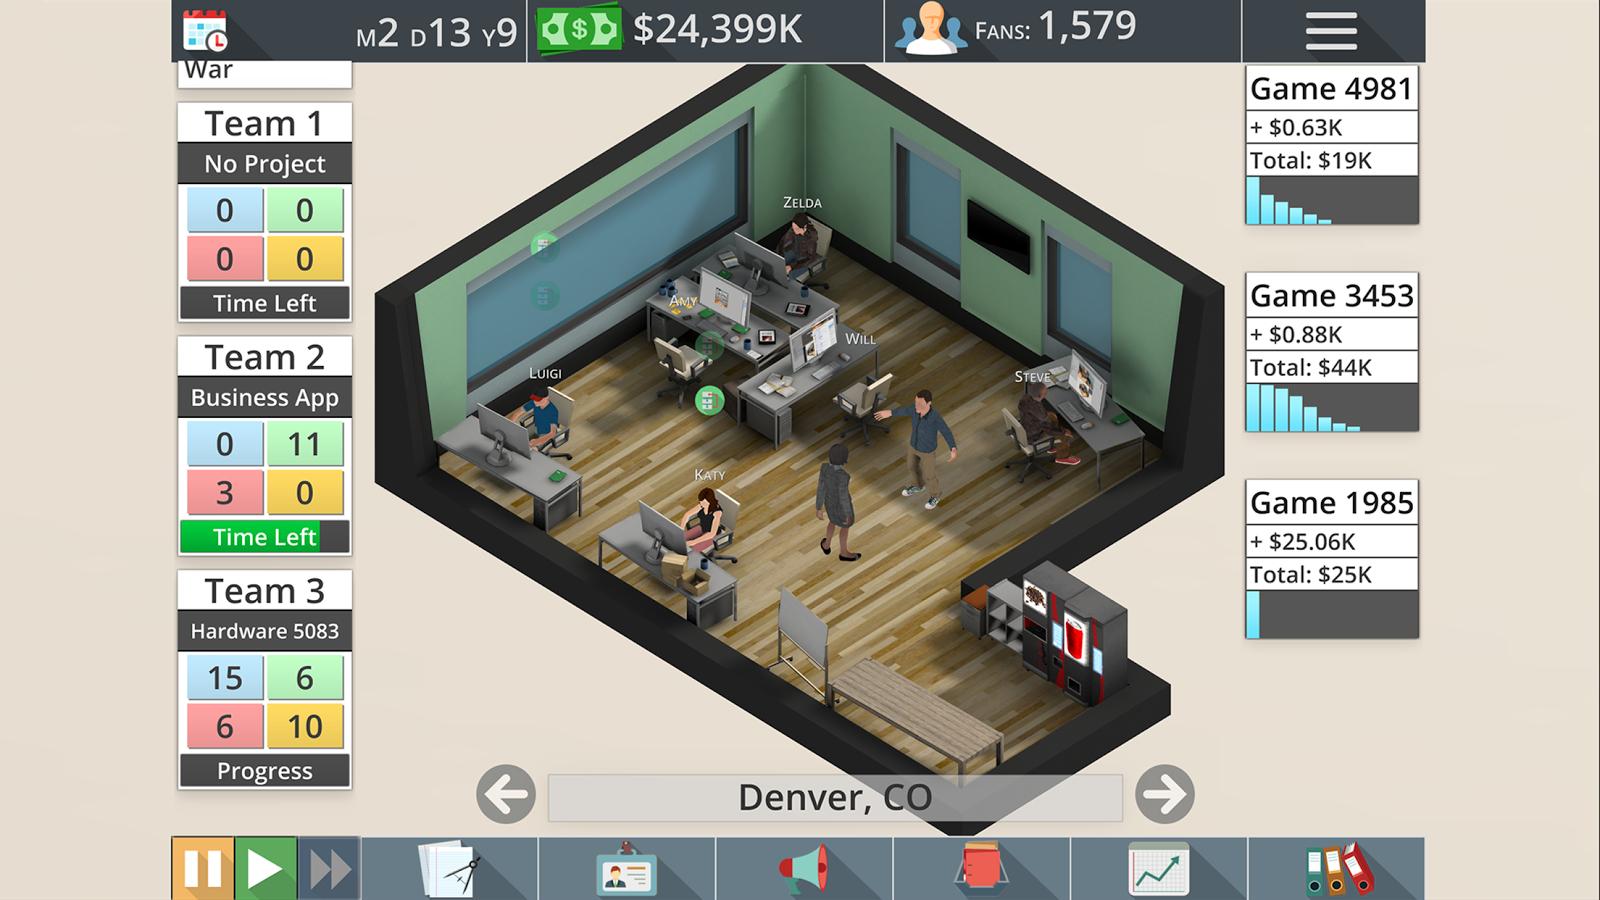 Game Studio Tycoon 3 kostenlos (statt 4,09€) [Android]